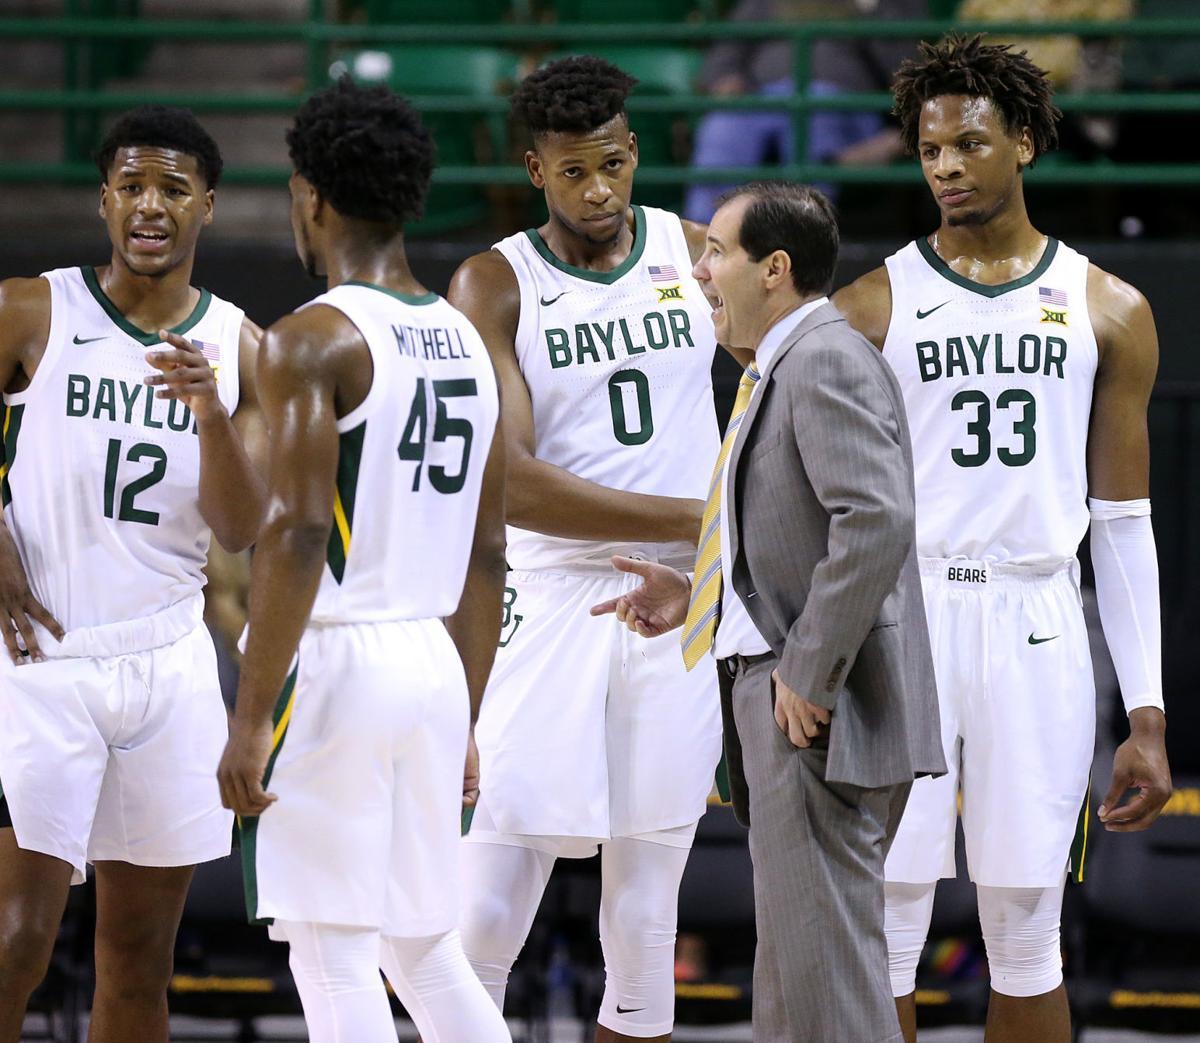 baylor basketball (copy)